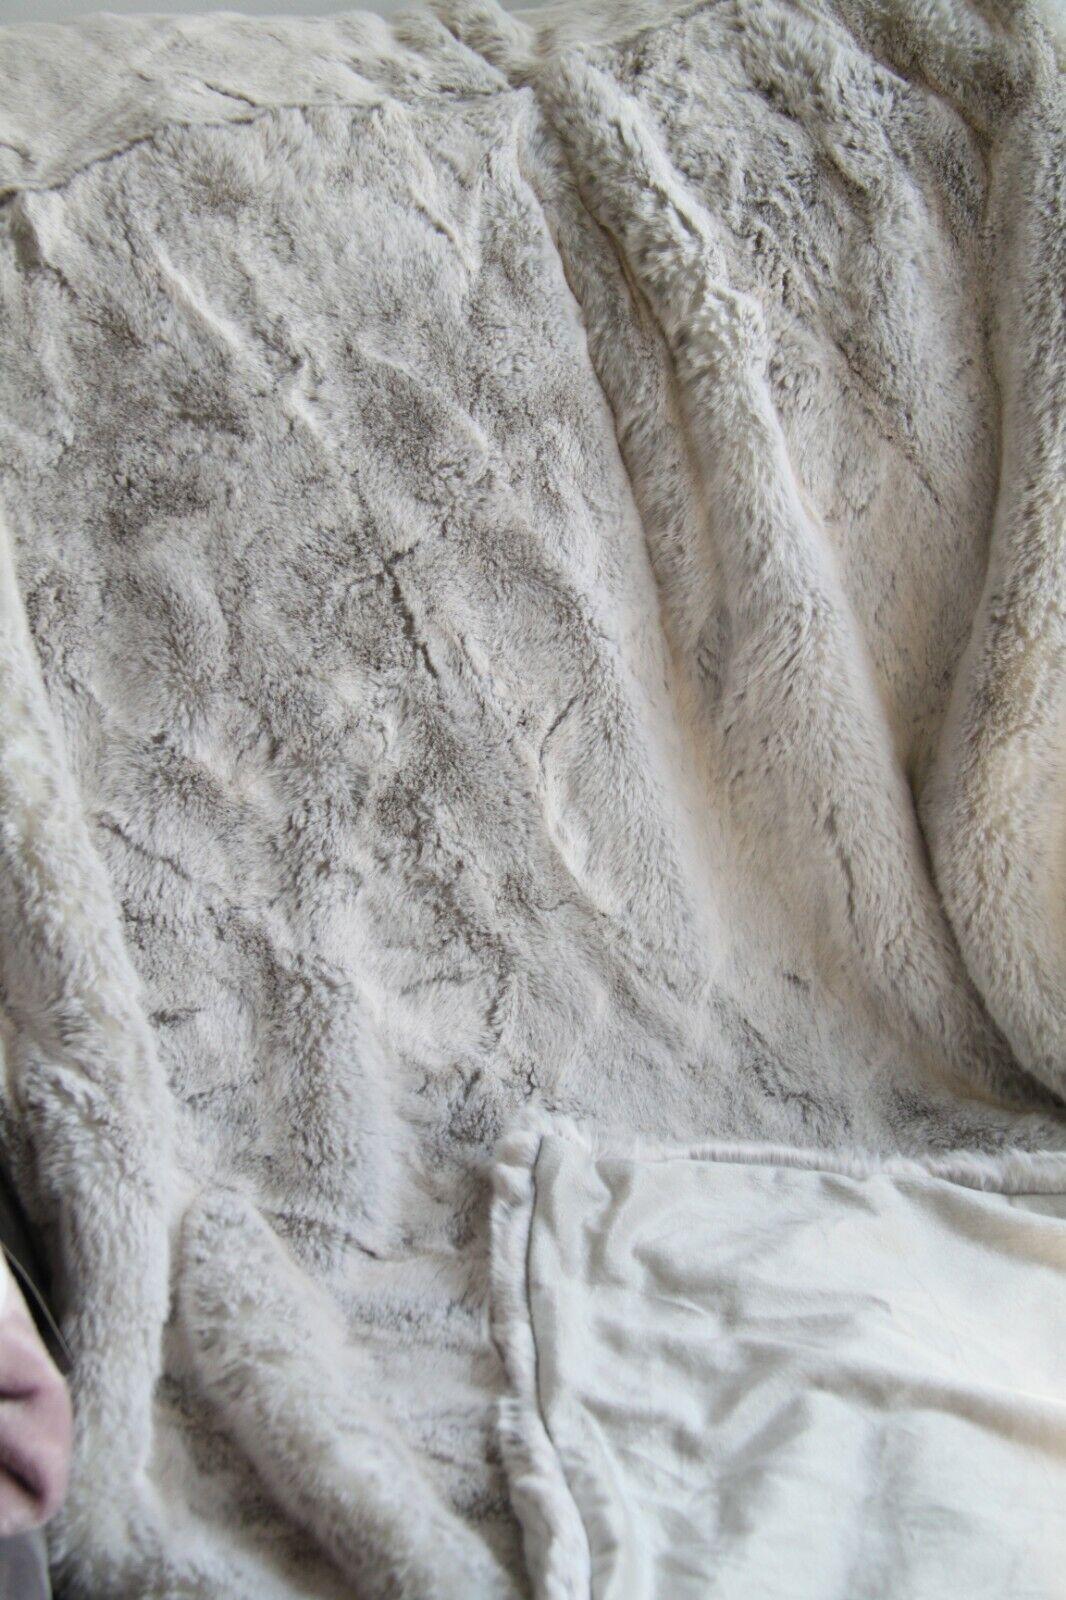 Polaris-Felldecke- Fellimitat,-in verschiedenen Größen, Kunstfell Überwurfdecke